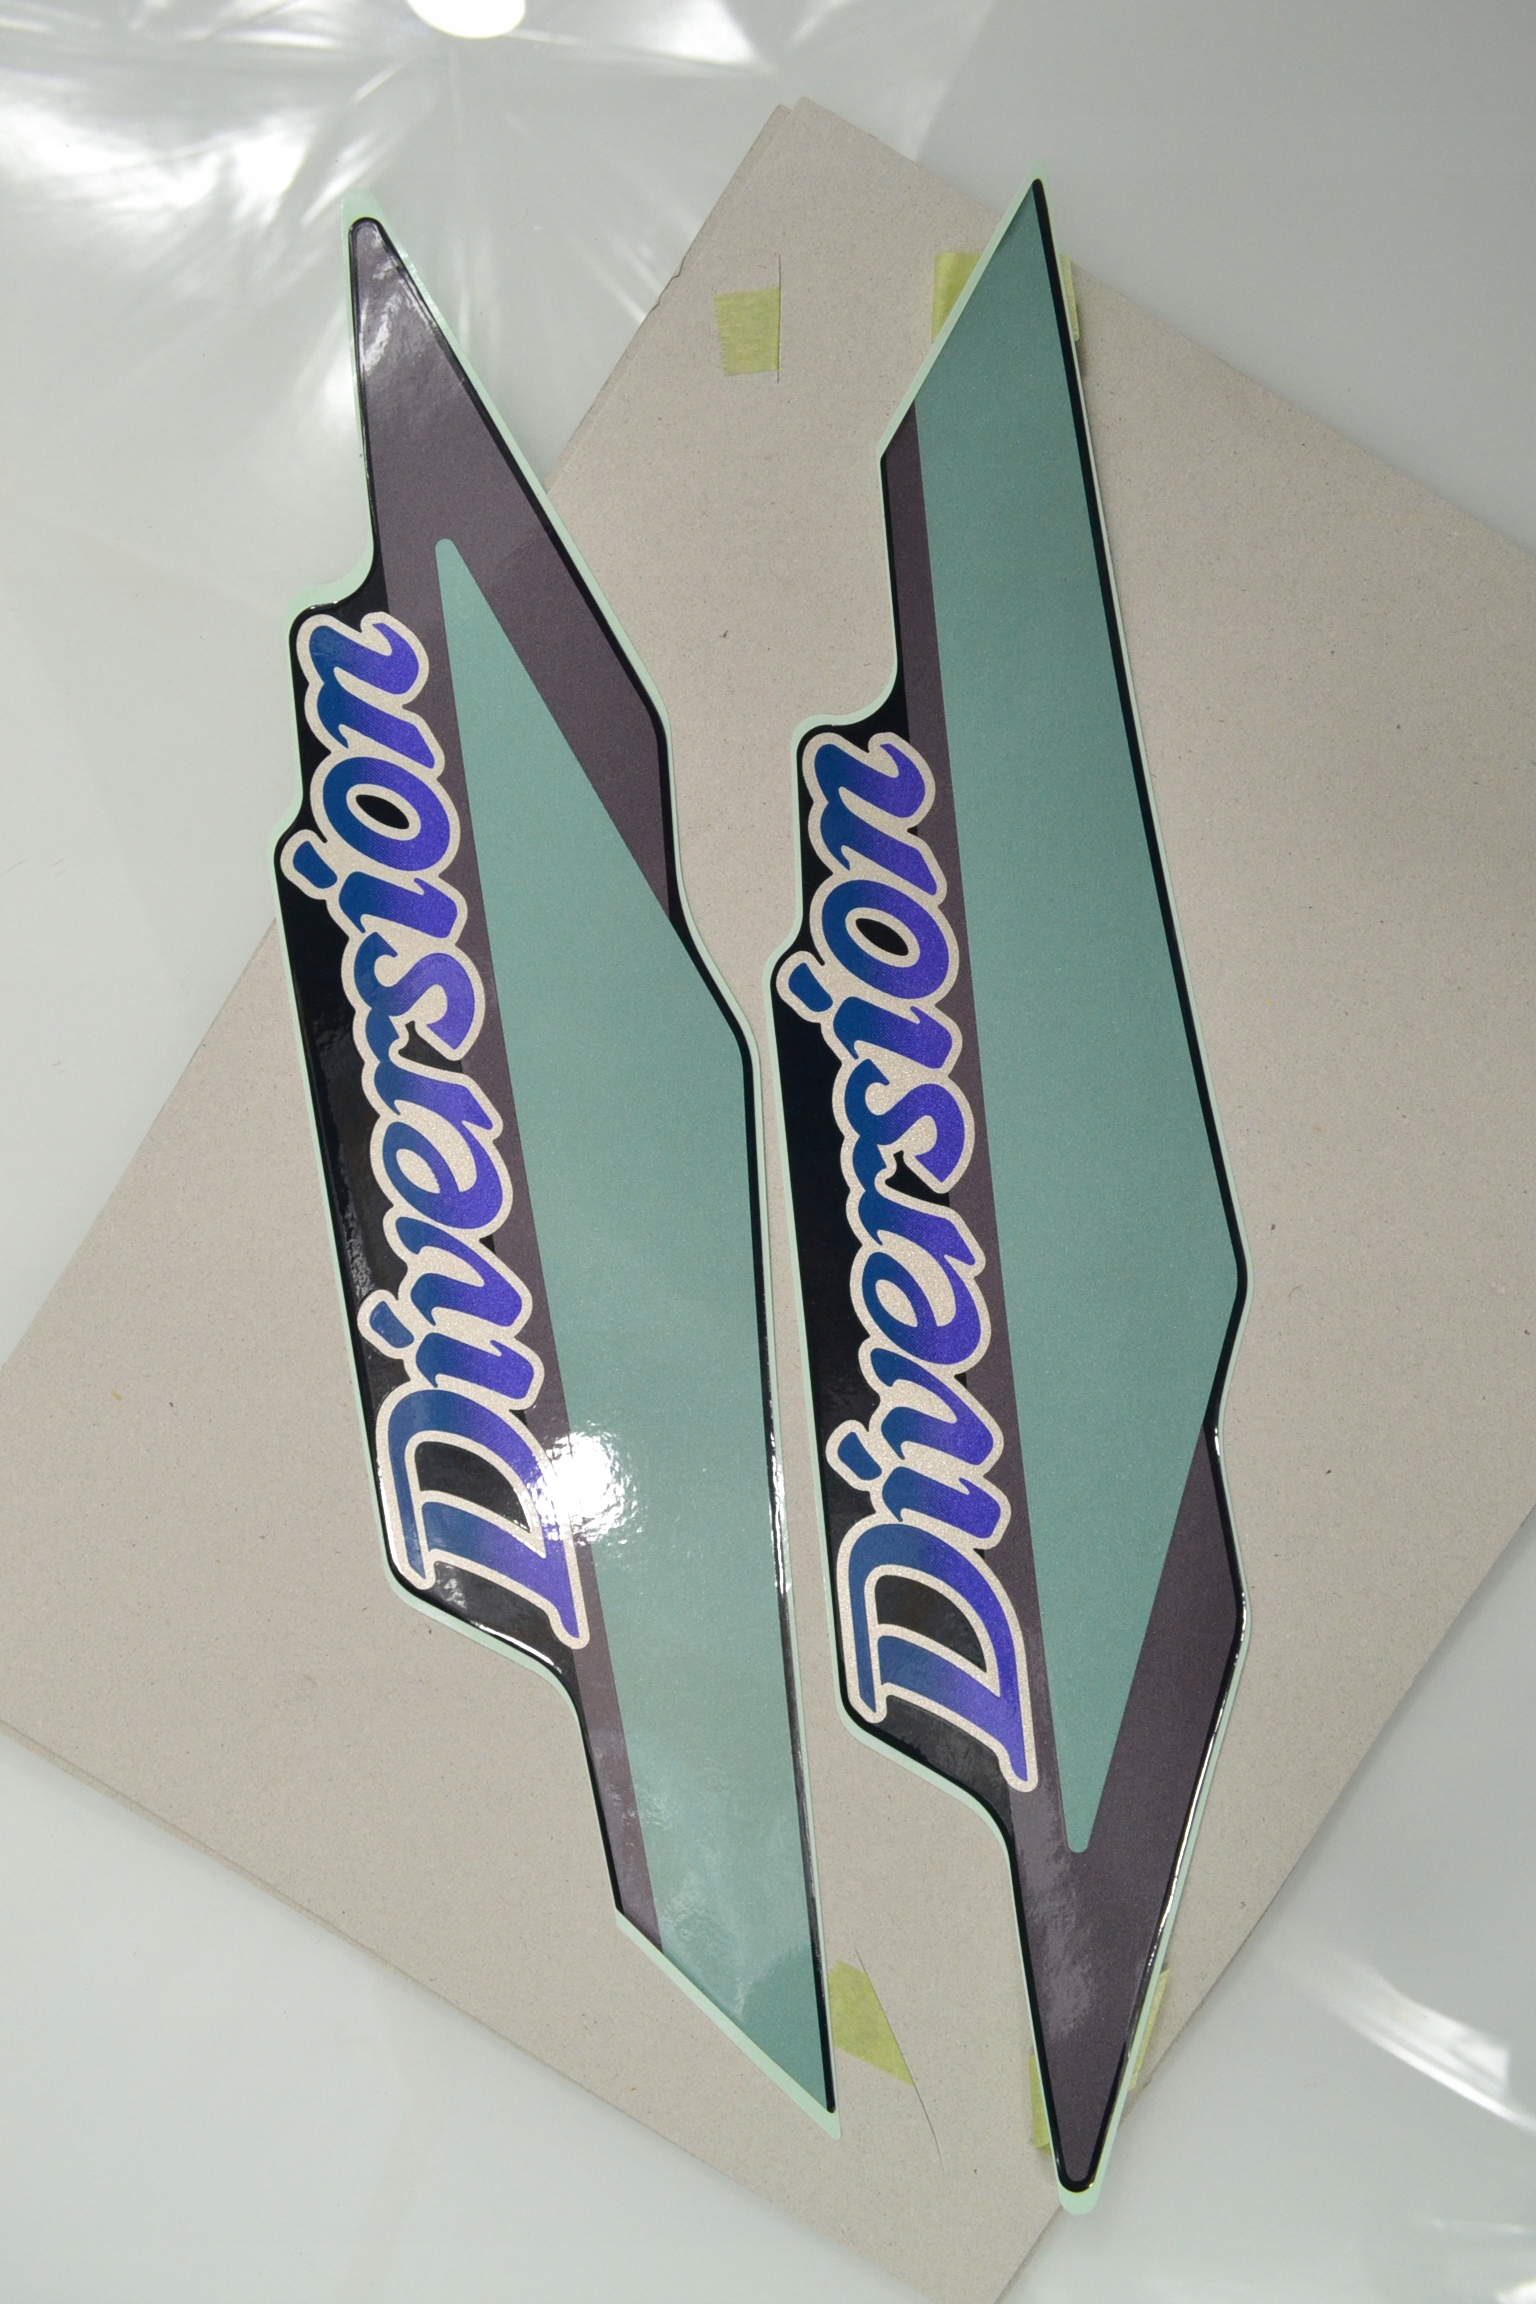 Яма XJ 600 S Diversion 1995 NAKLEJKA OKLEINA OEM